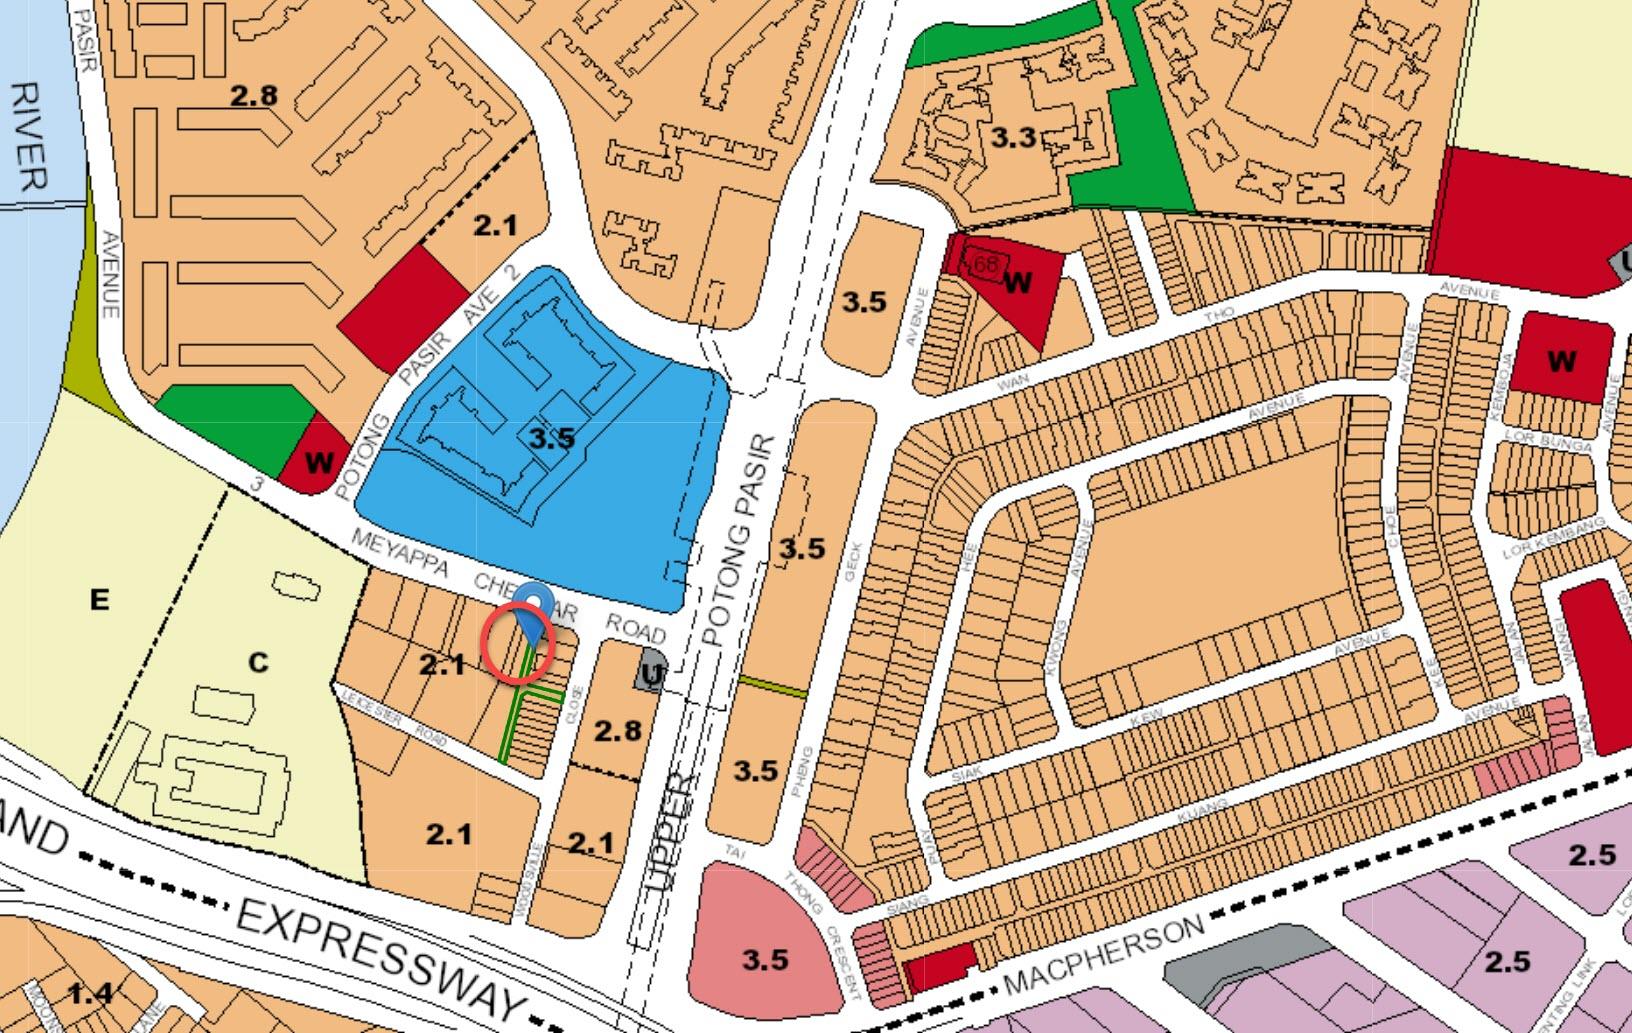 MYRA Condo Location - URA Master Plan Map